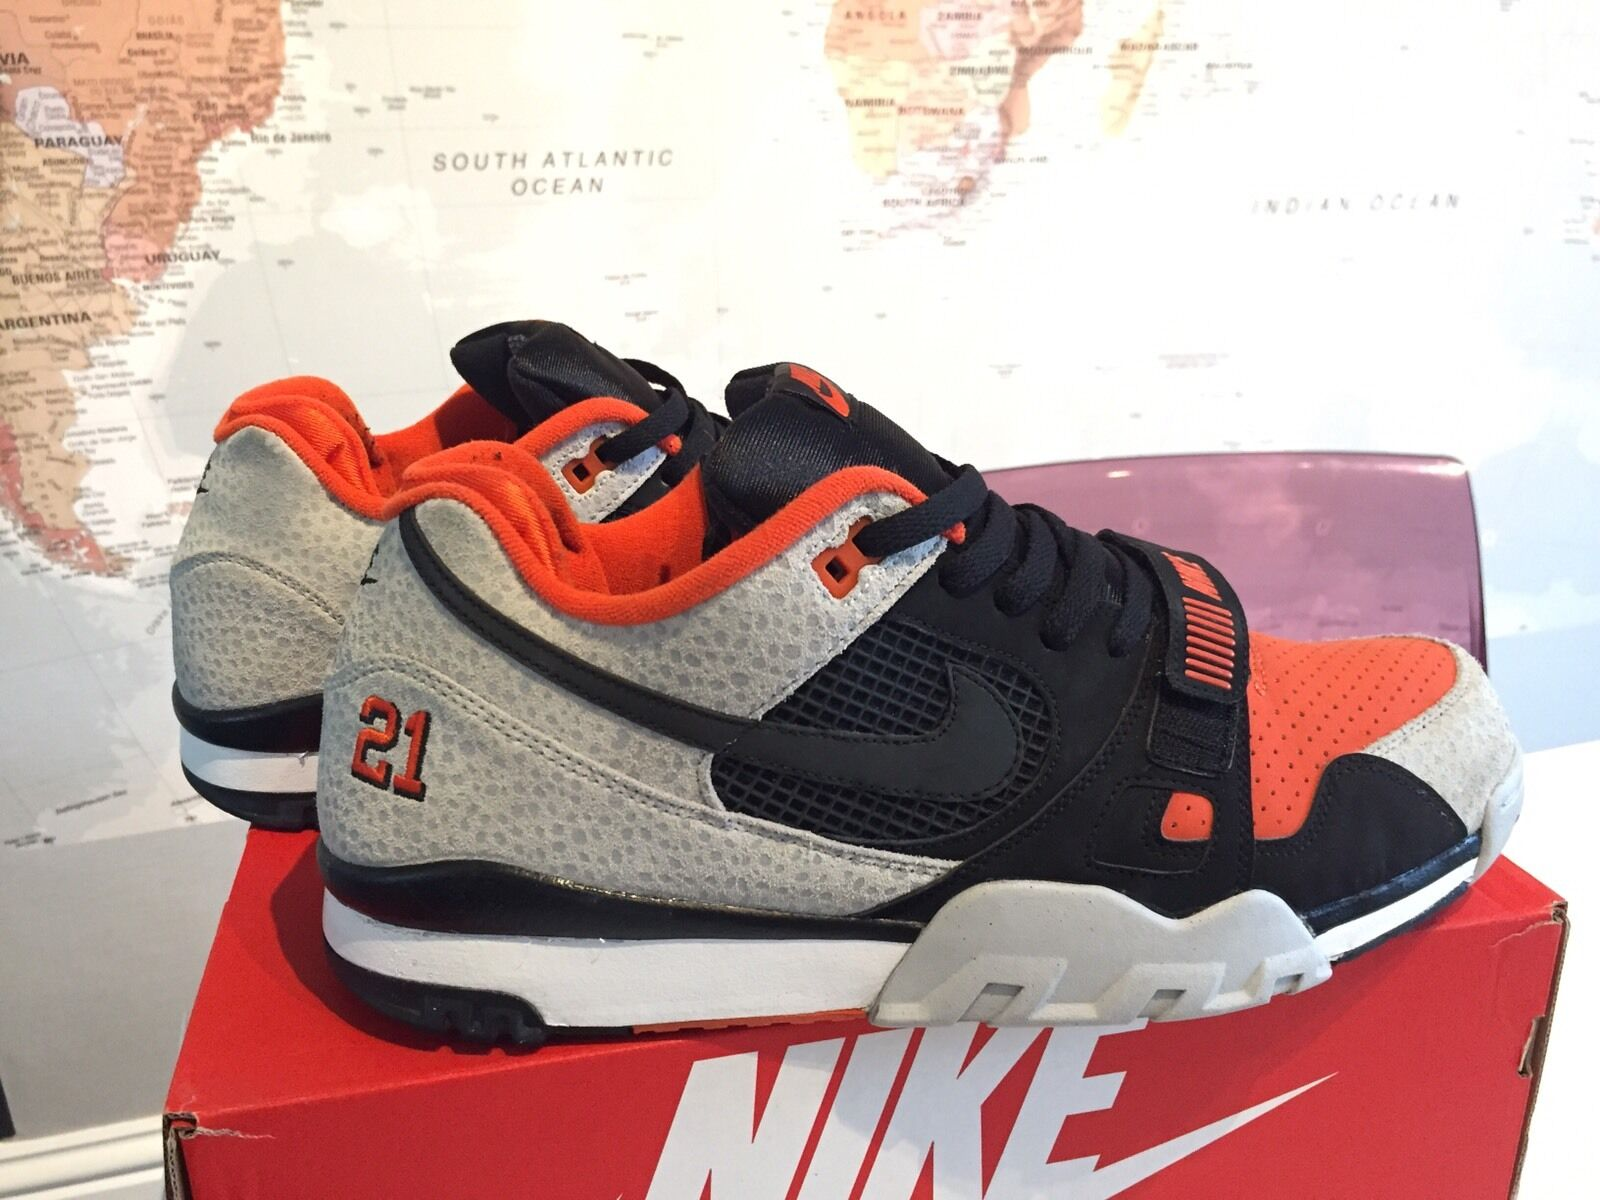 Used Nike Air Trainer 2 II Barry Sanders13   US 14   EU 48.5   PRM QS